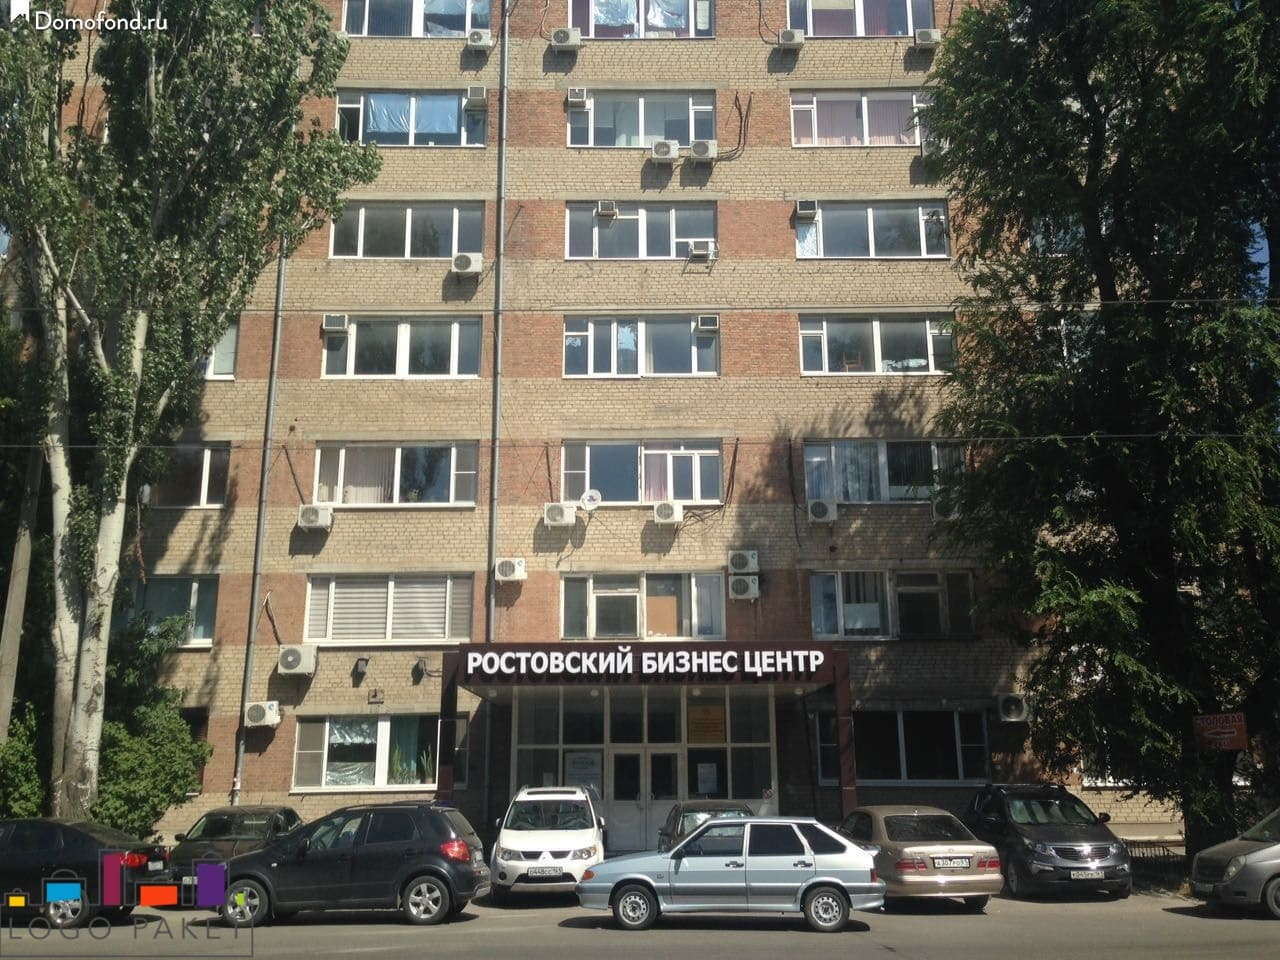 Офис LogoPaket в Ростове-на-Дону